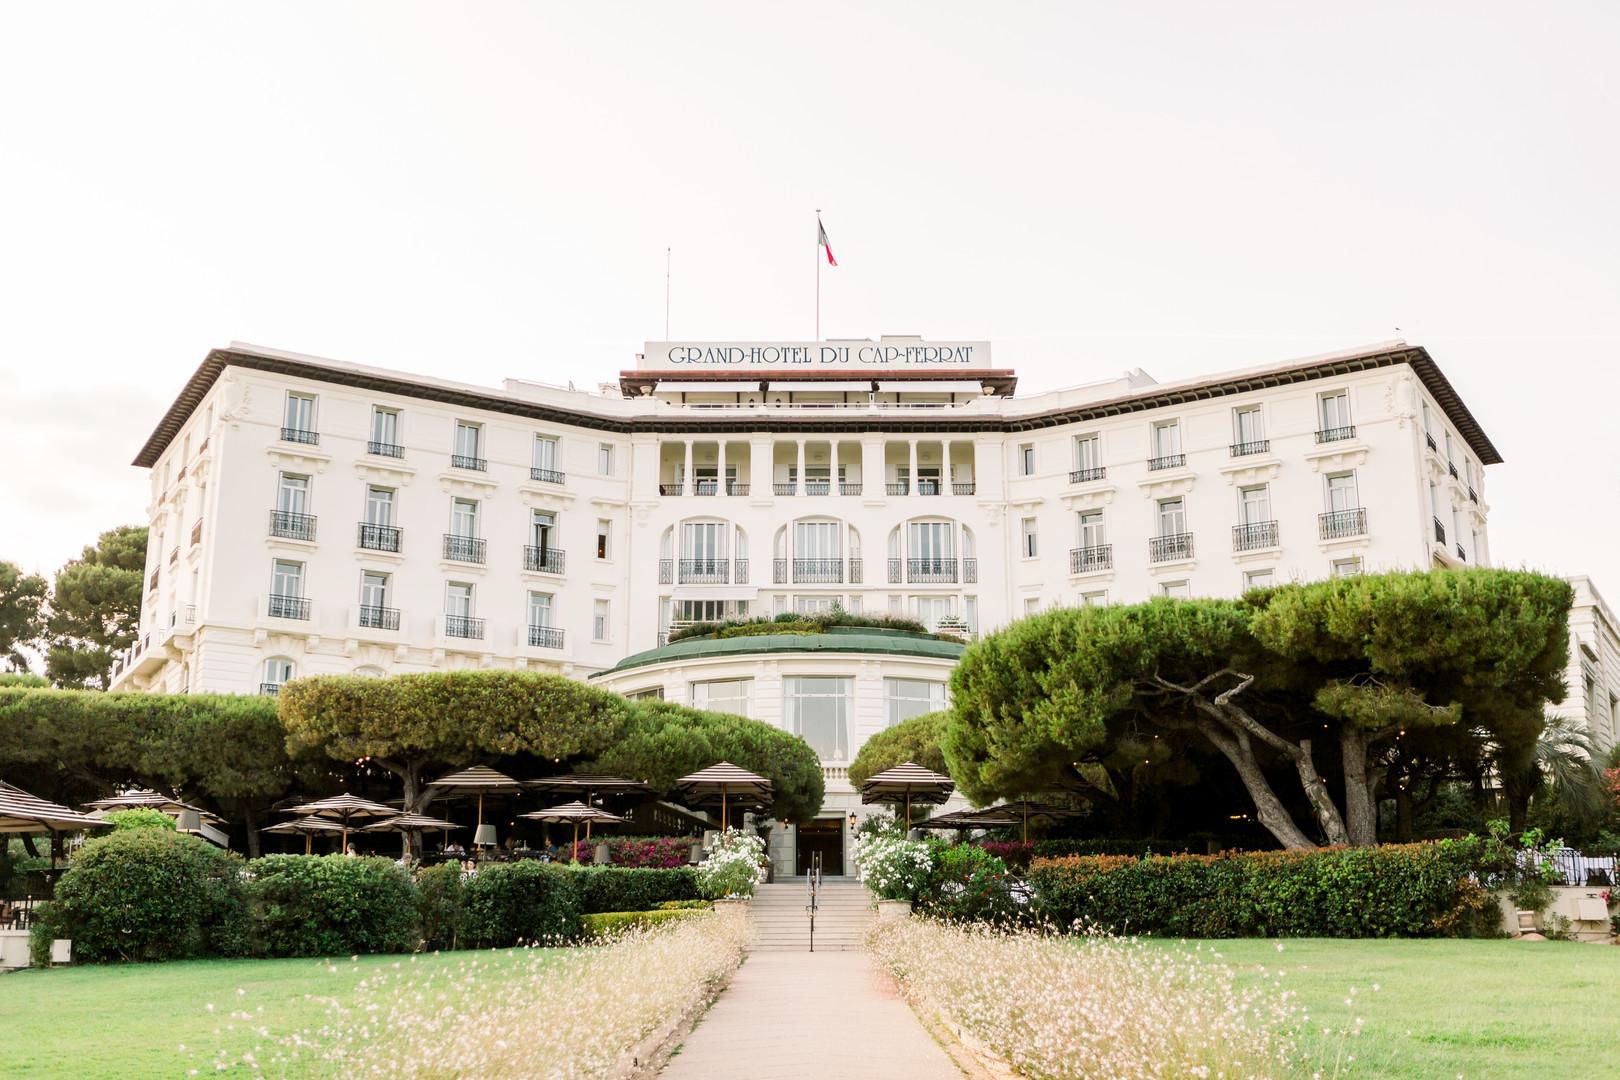 Grand Hotel du Cap Ferrat, Sandra Malbequi, Photographe mariage, Nice, Alpes Maritimes, Var, Monaco, France, Sandramalbequiphotography.com